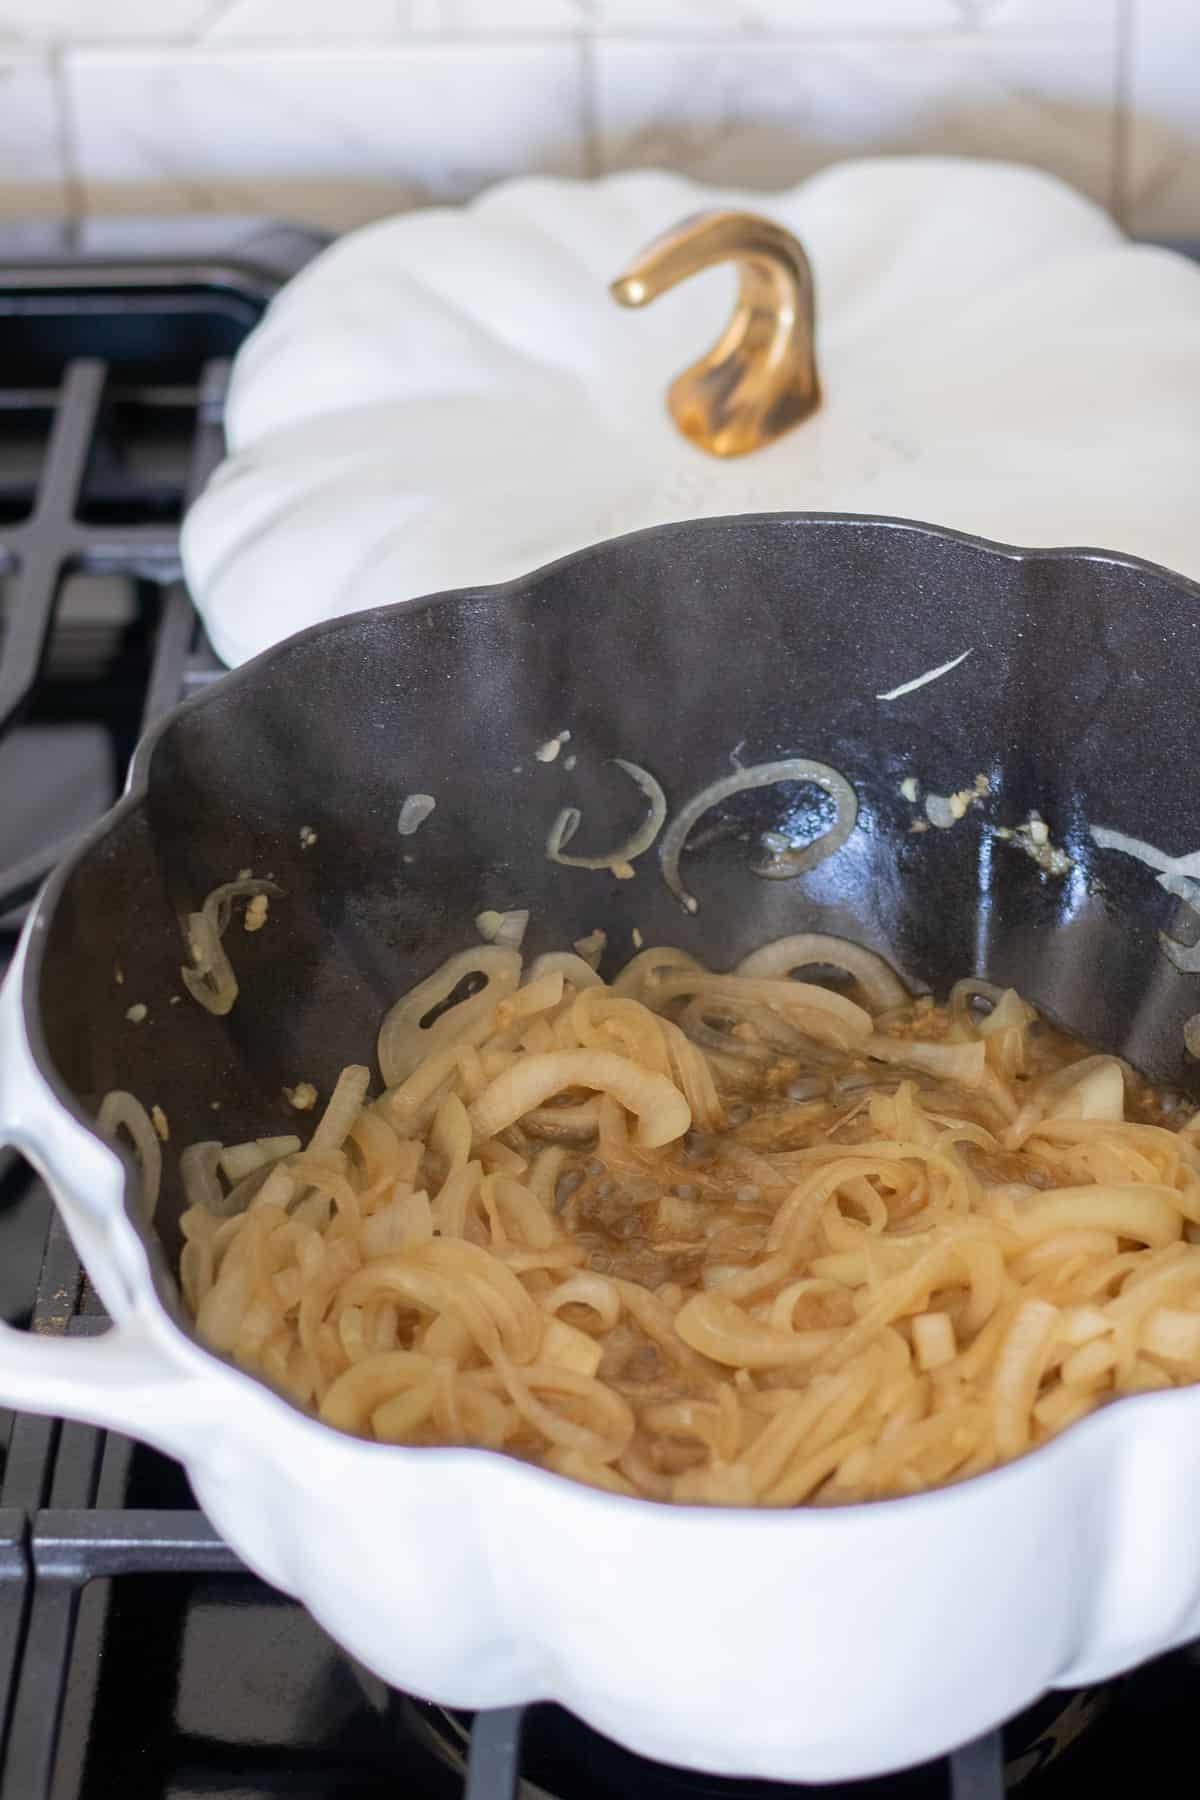 Sautéed onions in large pot